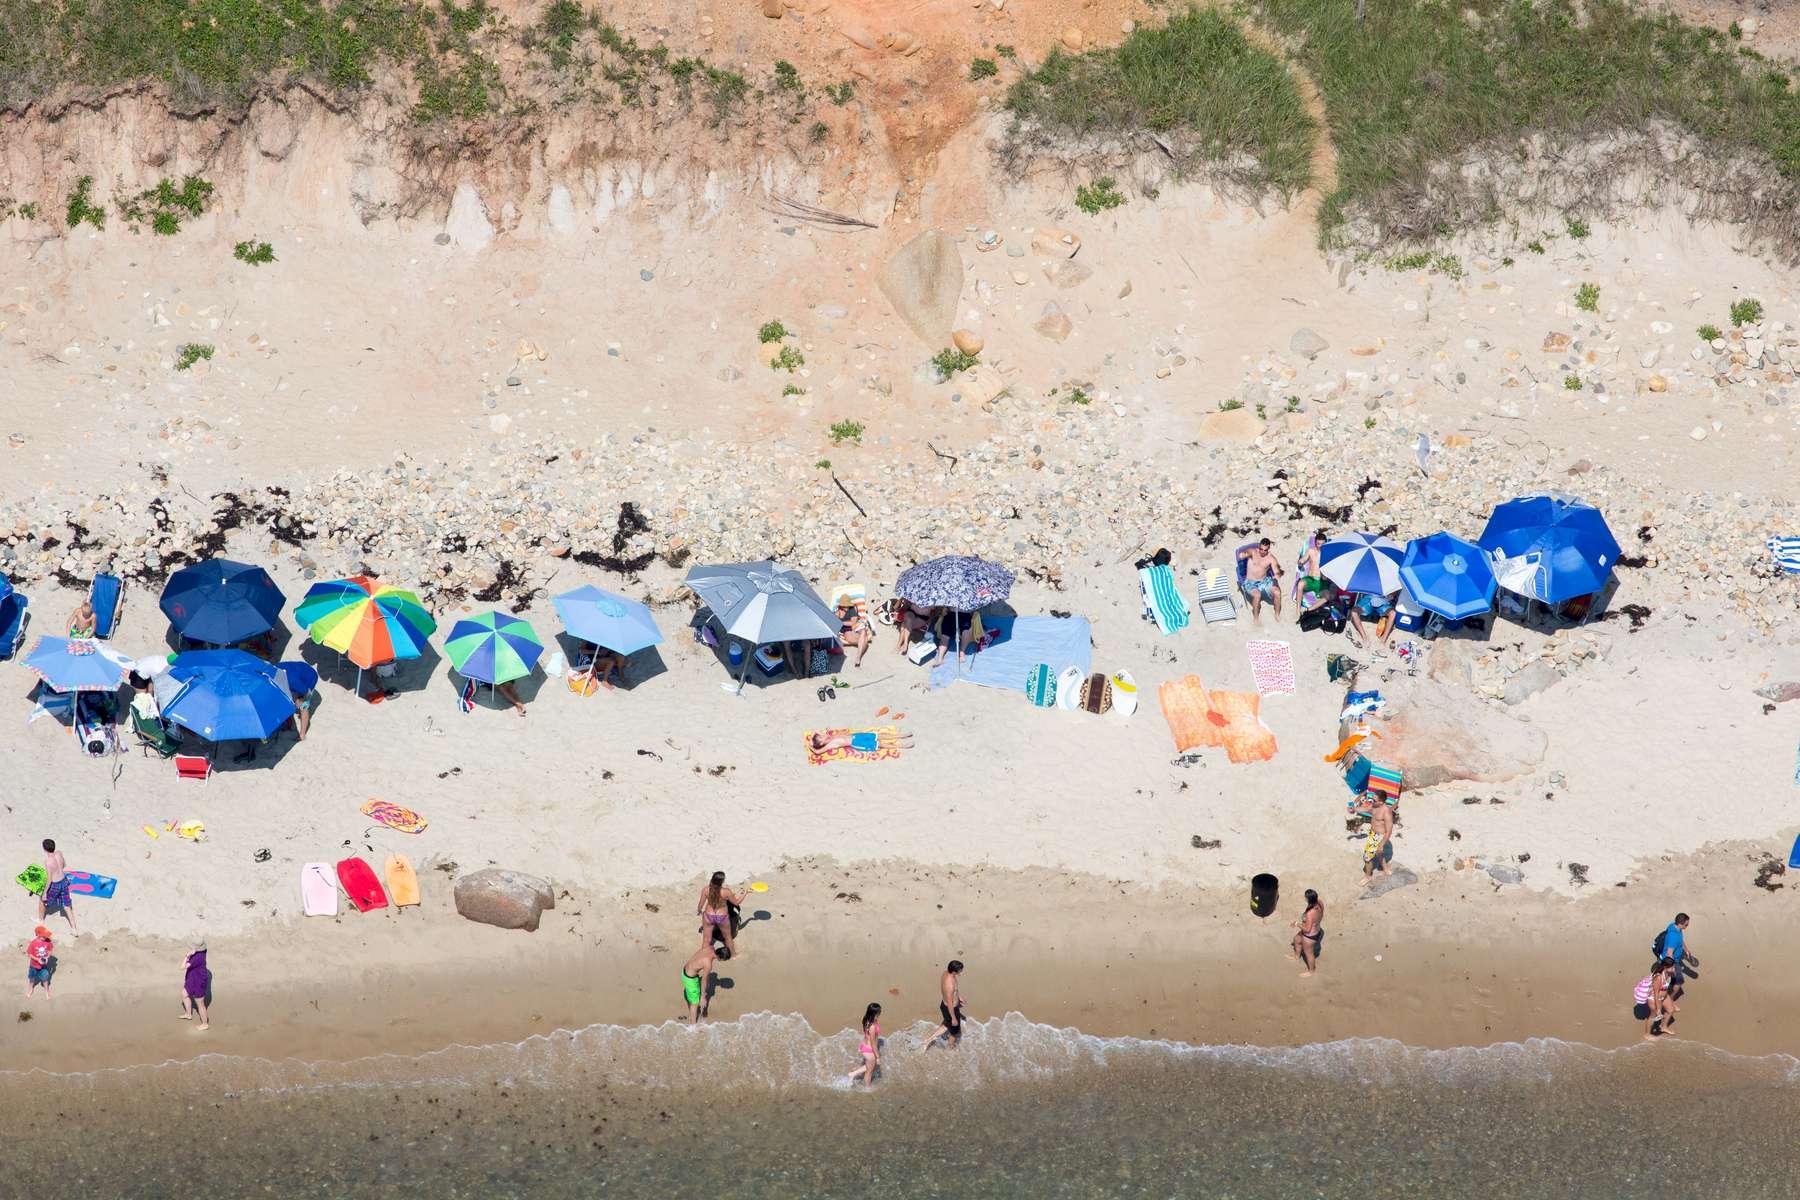 Beach Day (130717-0210)